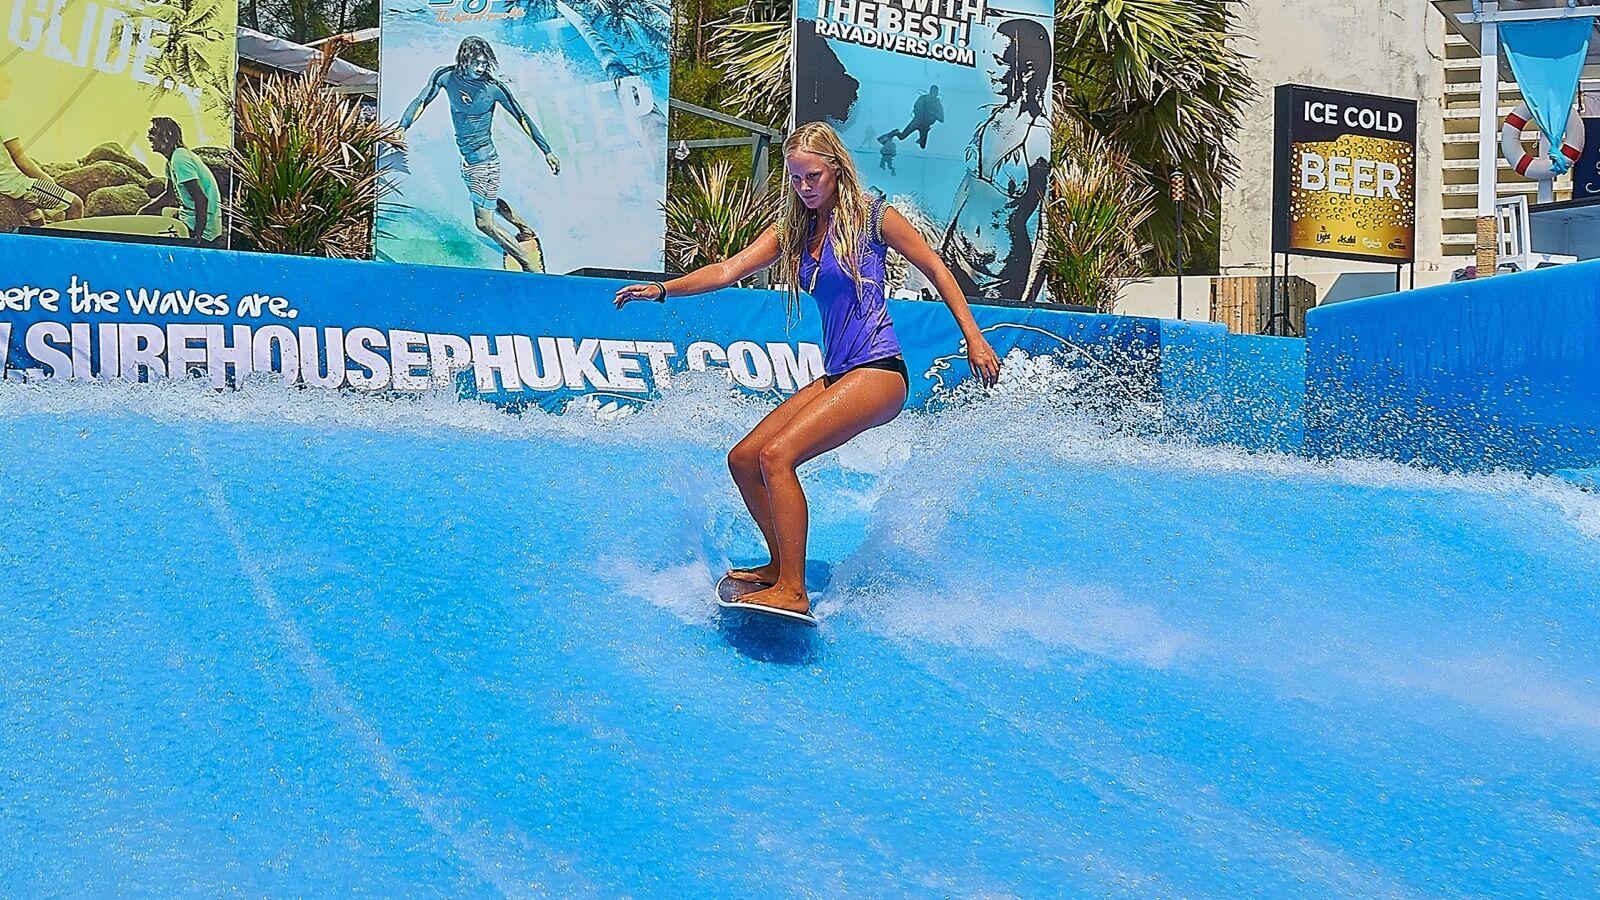 Surf House Phuket